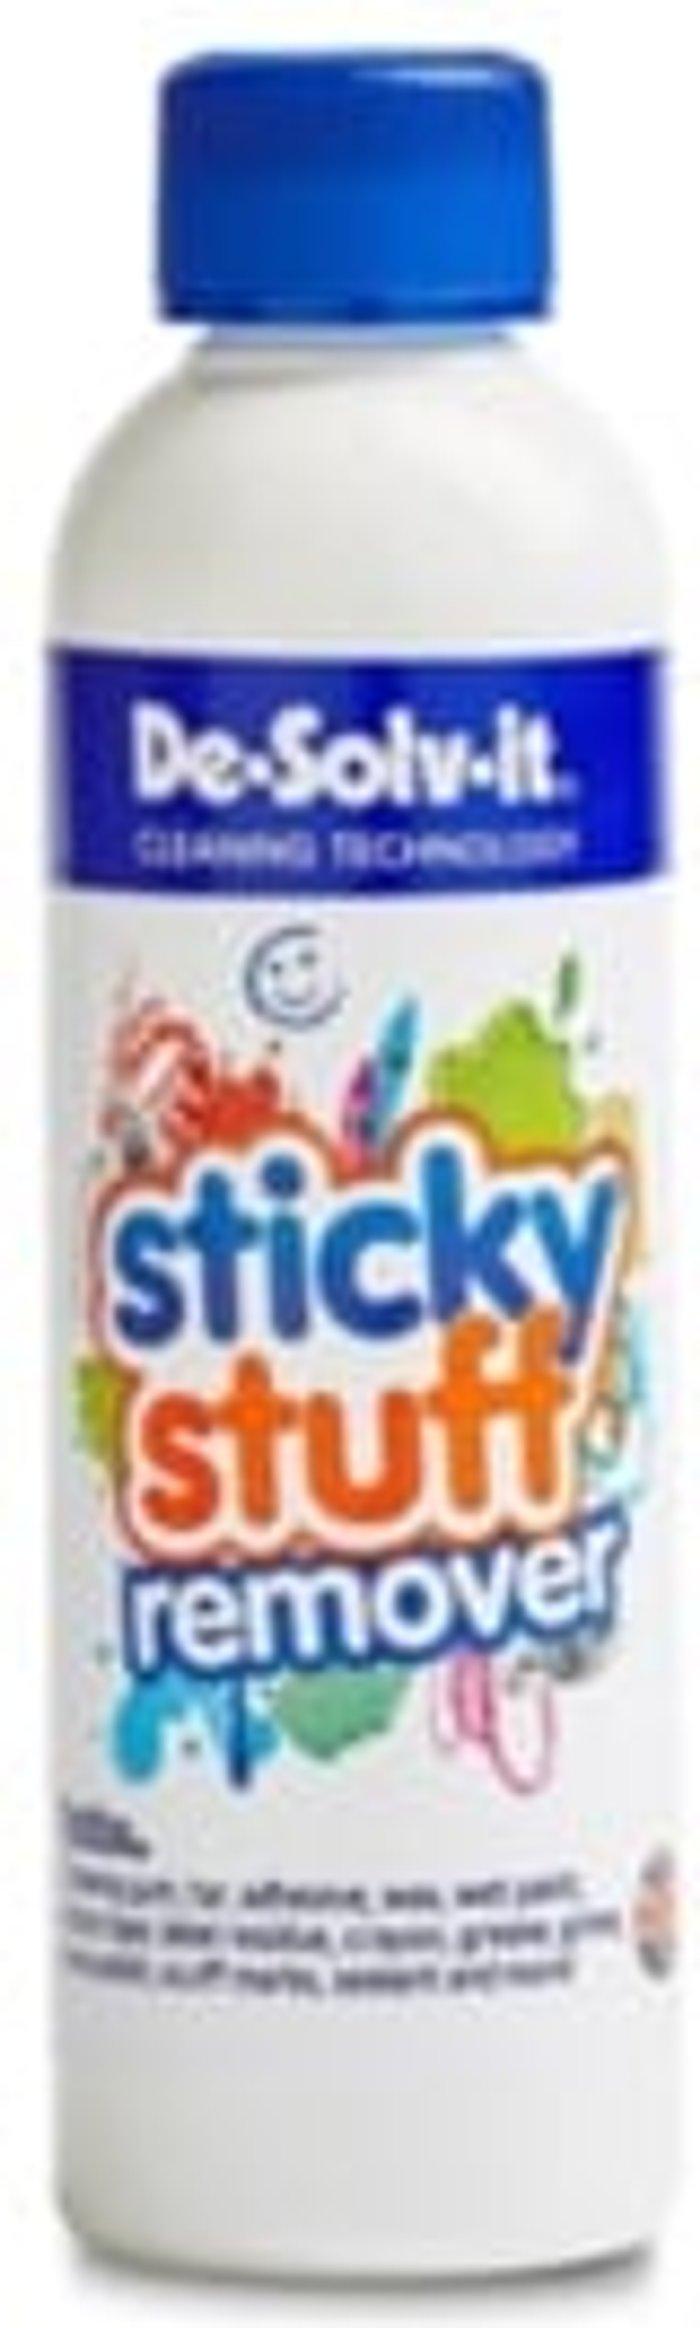 De-Solv-it De-Solv-It Sticky Stuff Remover 250ml